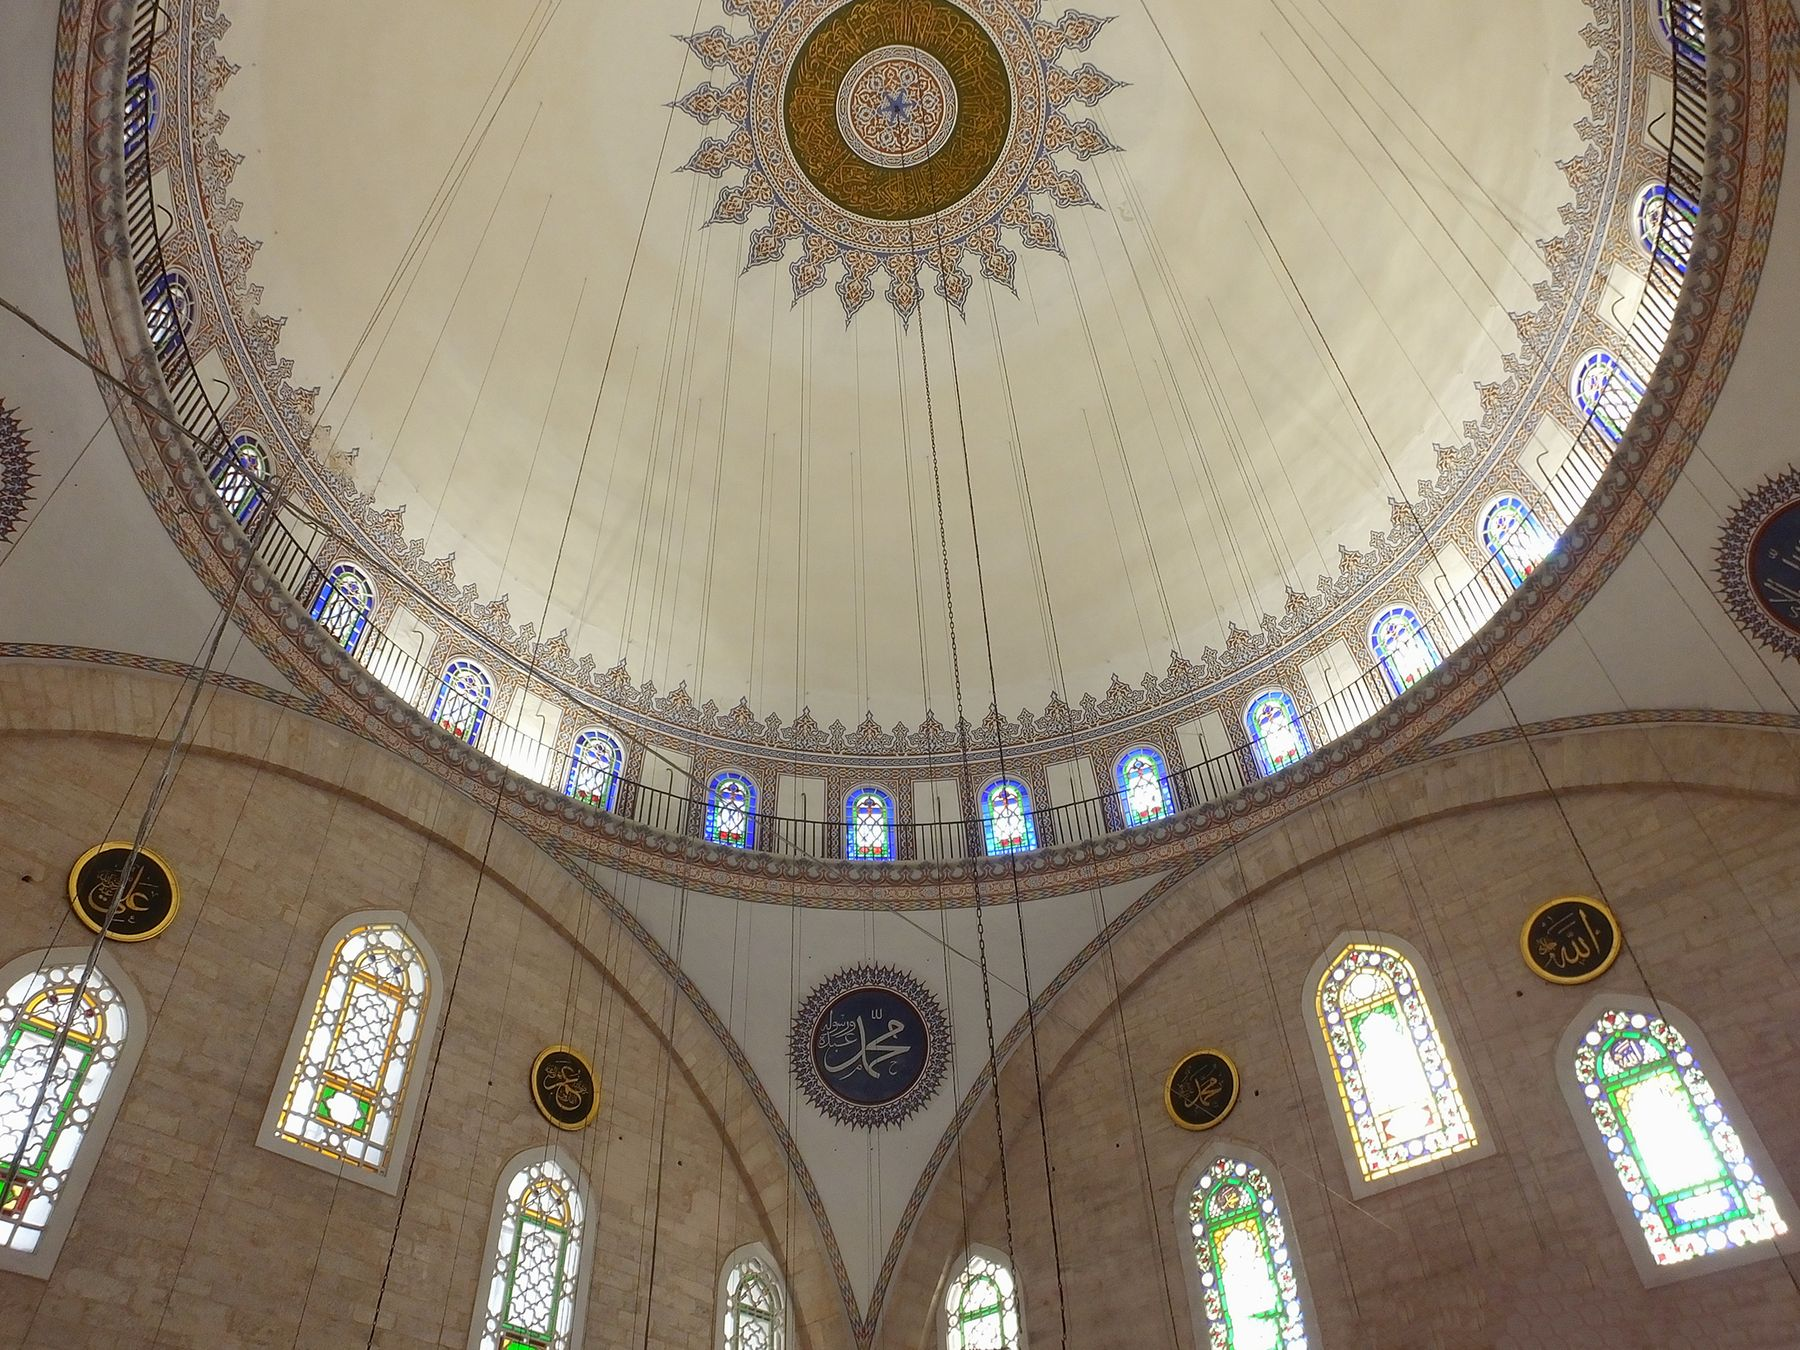 Красота ислама.Мечеть султана Явуза.Стамбул.